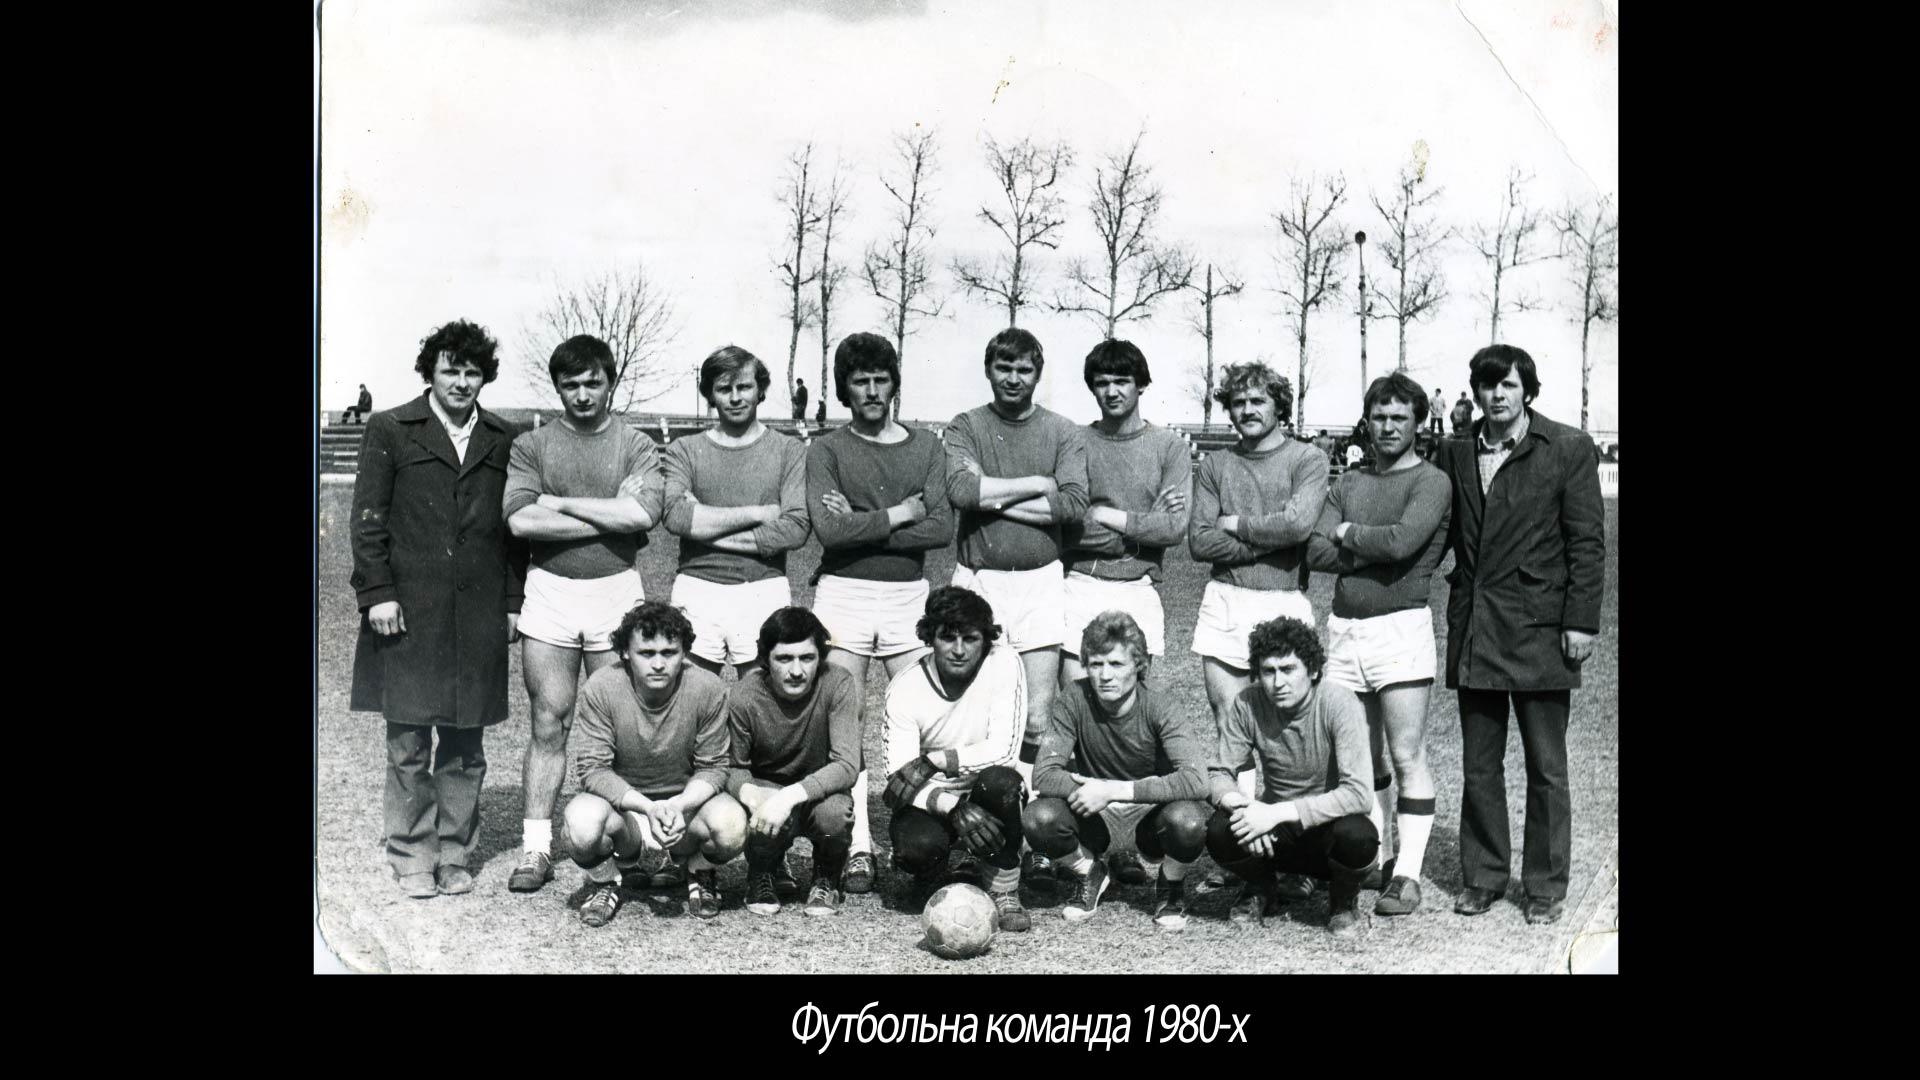 Футбольна команда 1980-х рр